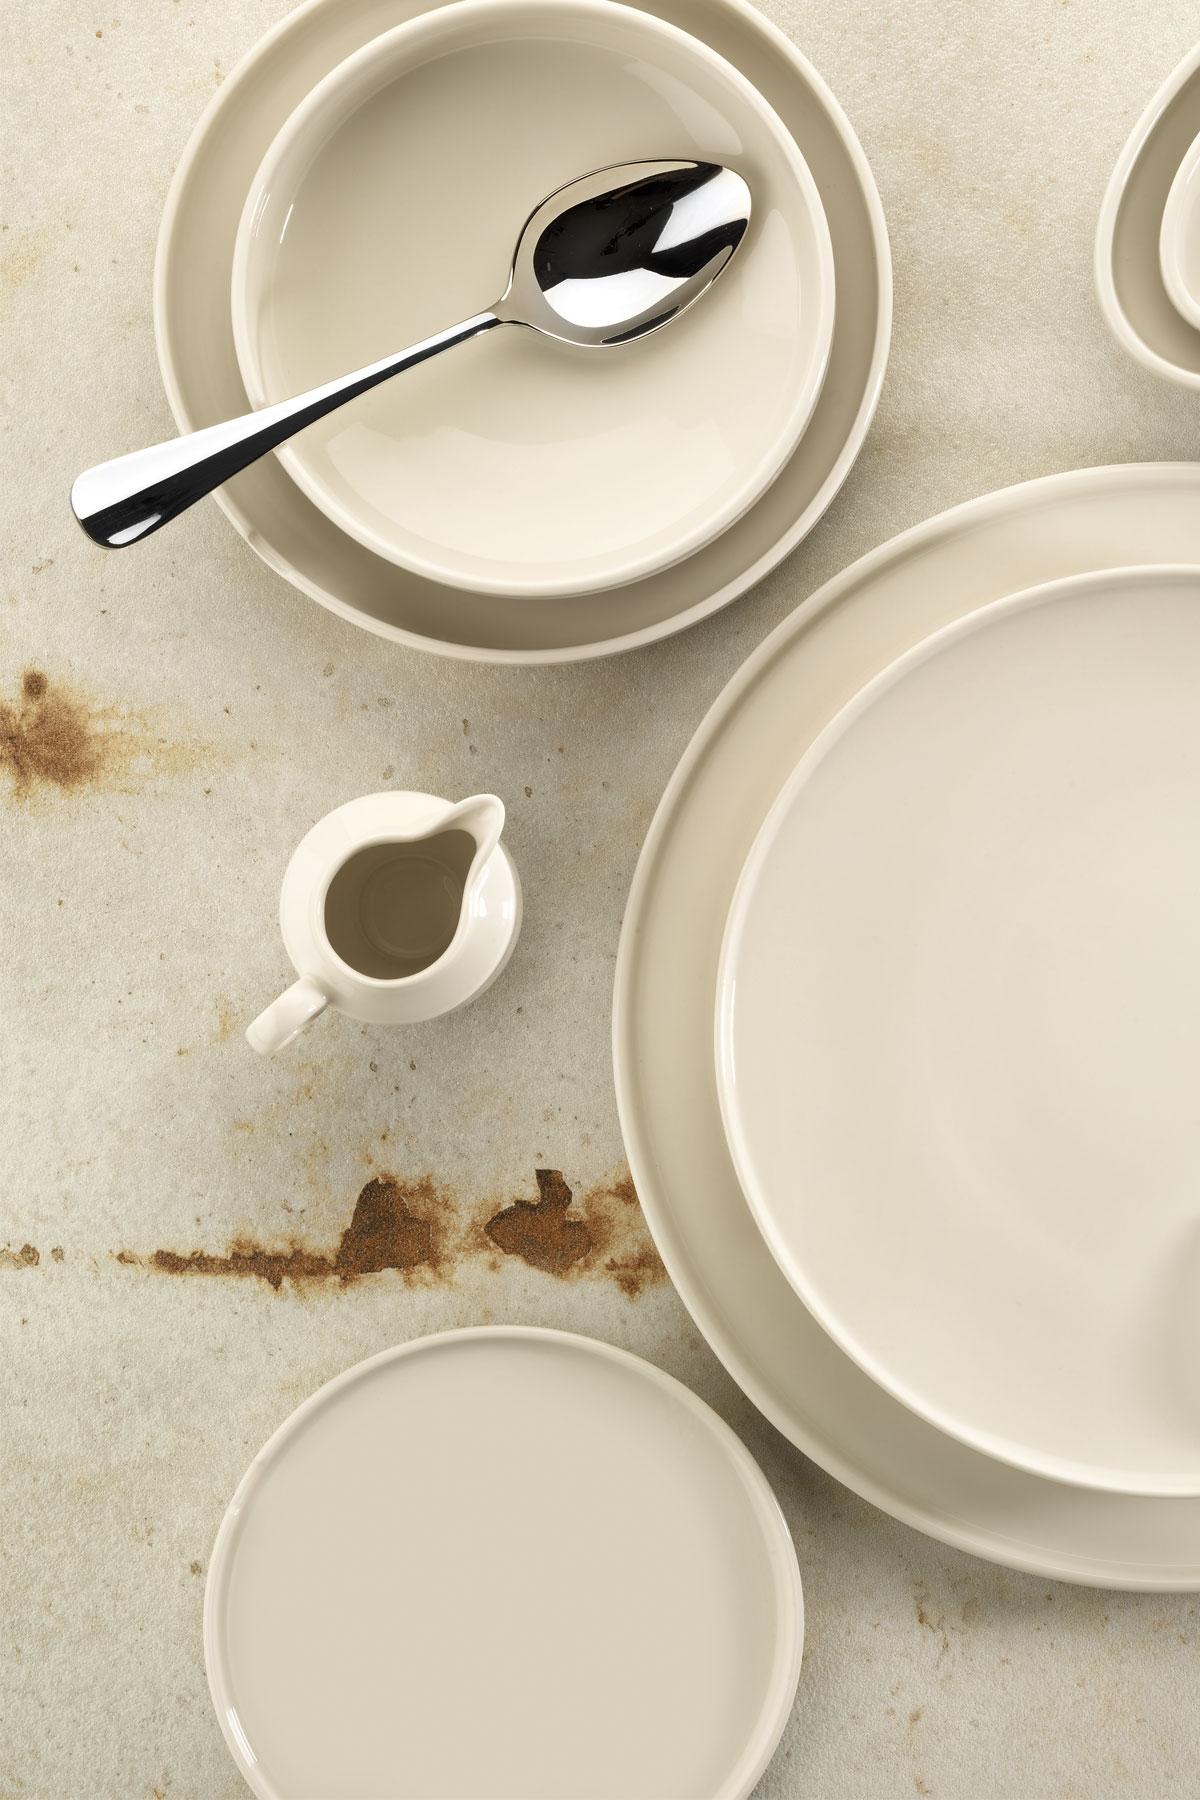 Kütahya Porselen Chef Taste Of 30 cm Düz Tabak Krem